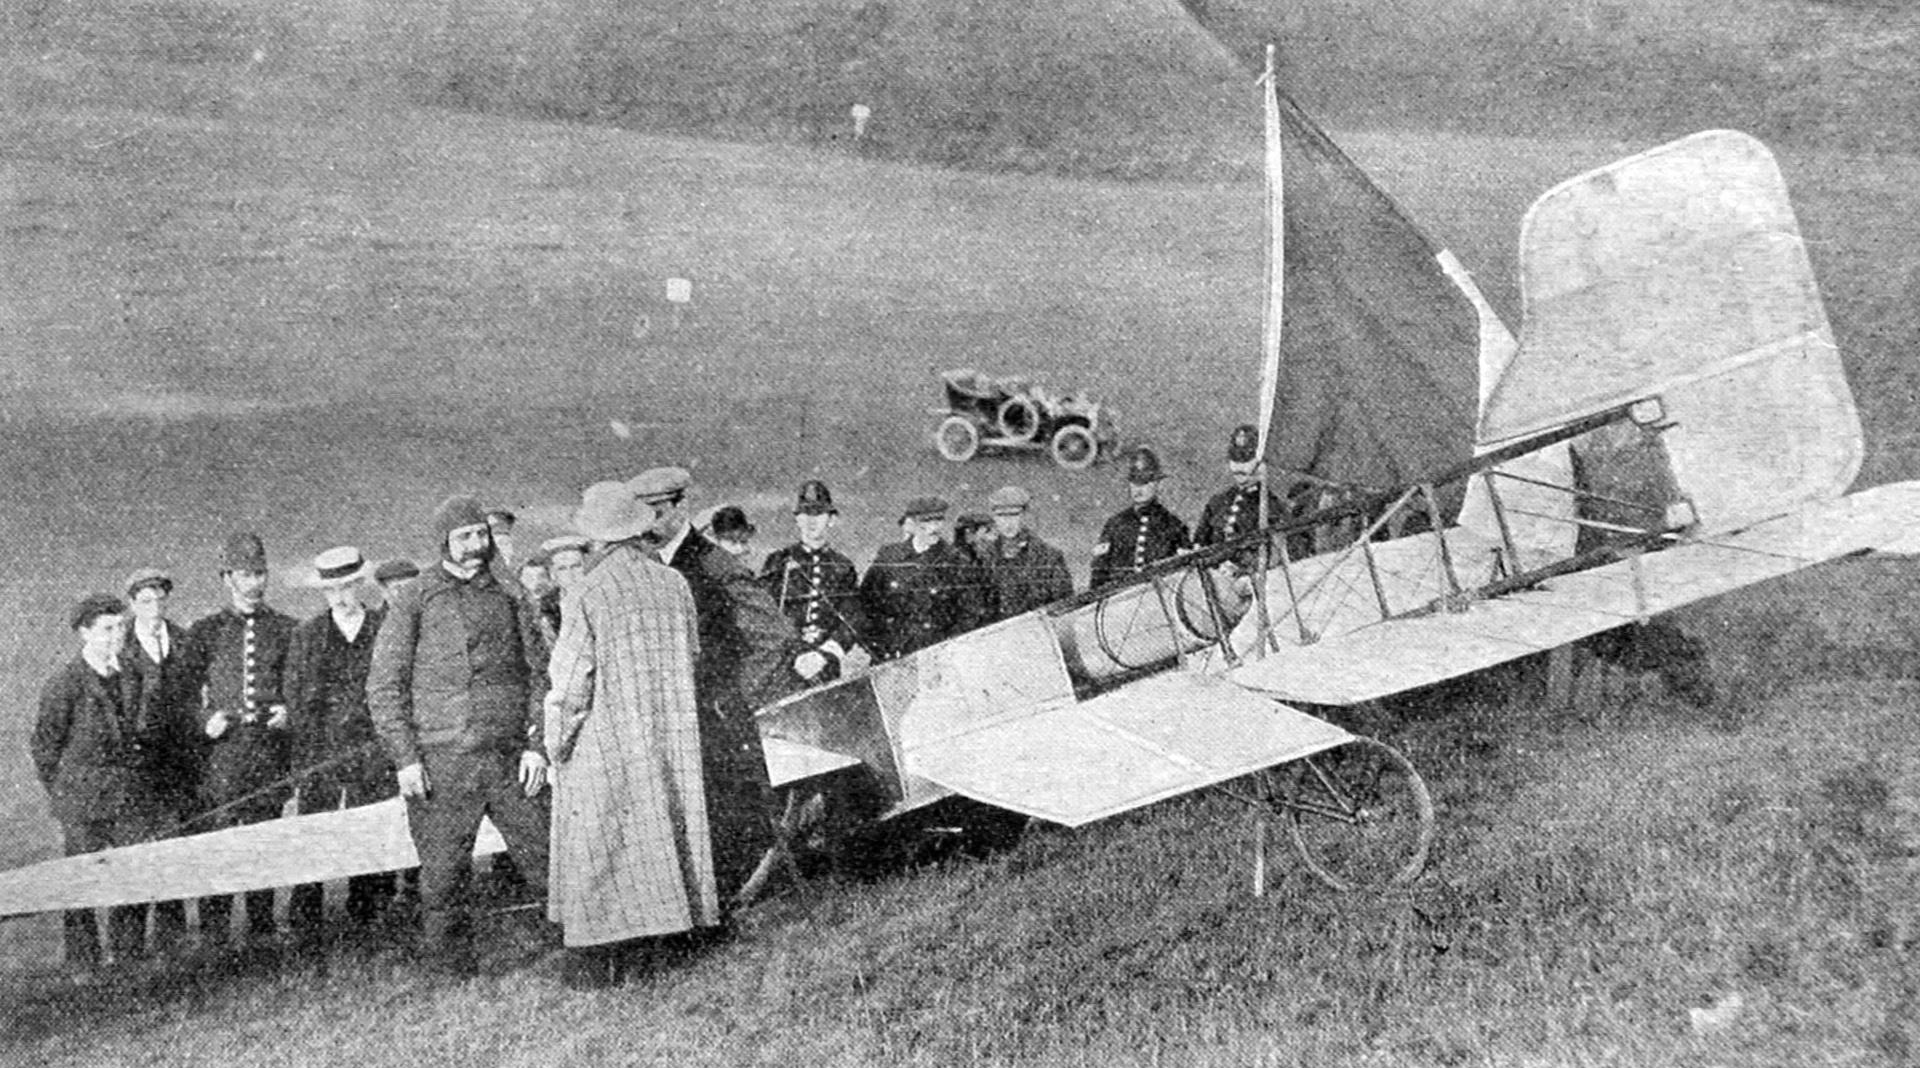 Zenith Pilot Louis Bleriot XI plane